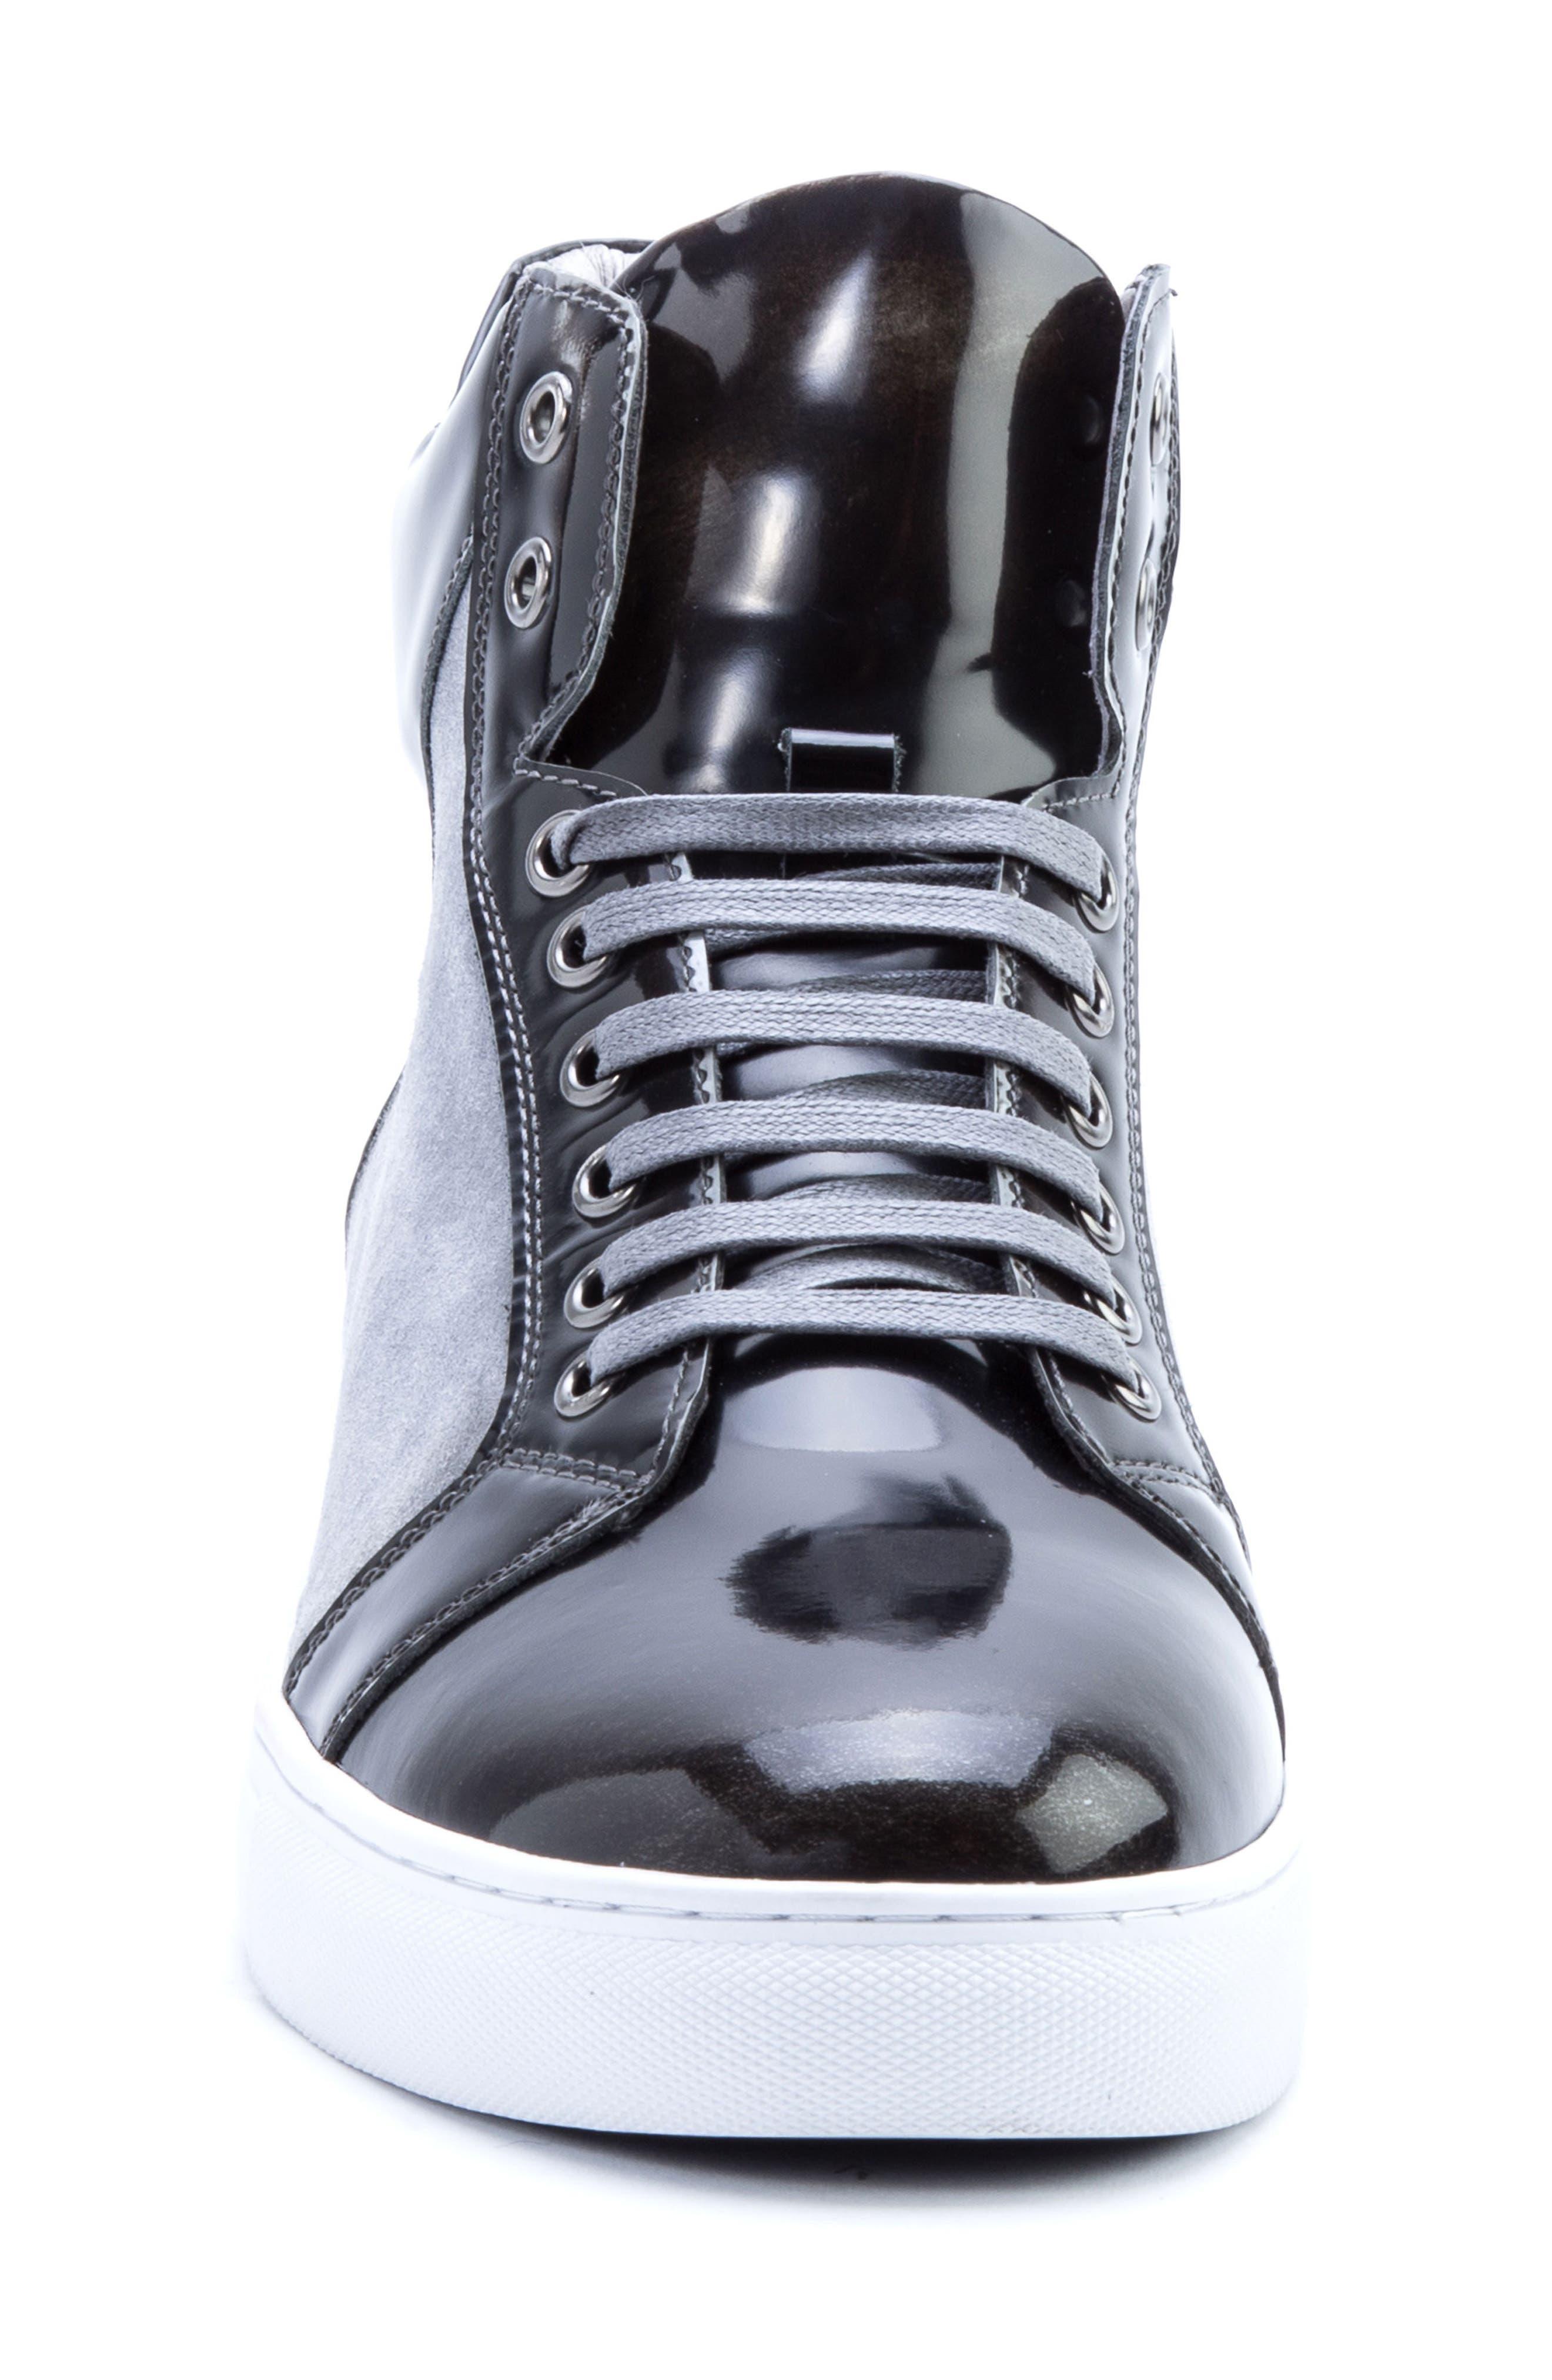 BADGLEY MISCHKA COLLECTION, Badgley Mischka Douglas High Top Sneaker, Alternate thumbnail 4, color, 001